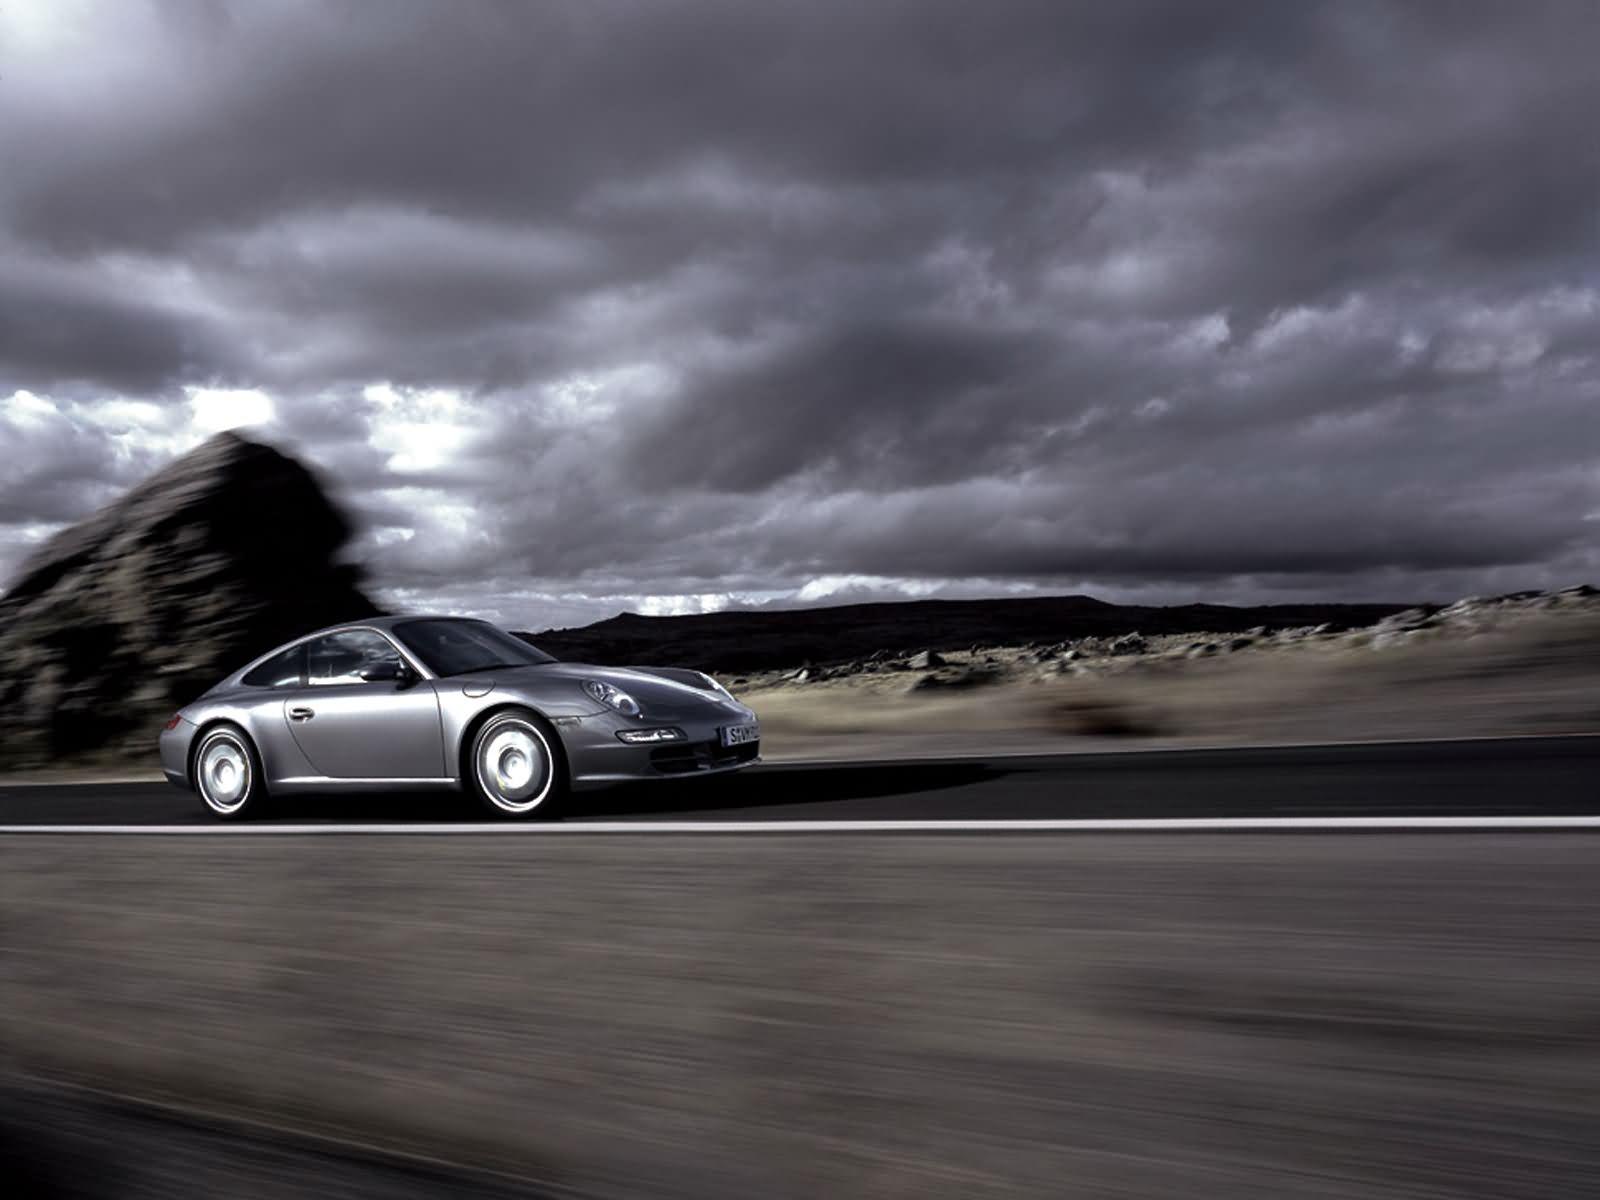 Porsche 997 911 Carrera S Photos Photogallery With 52